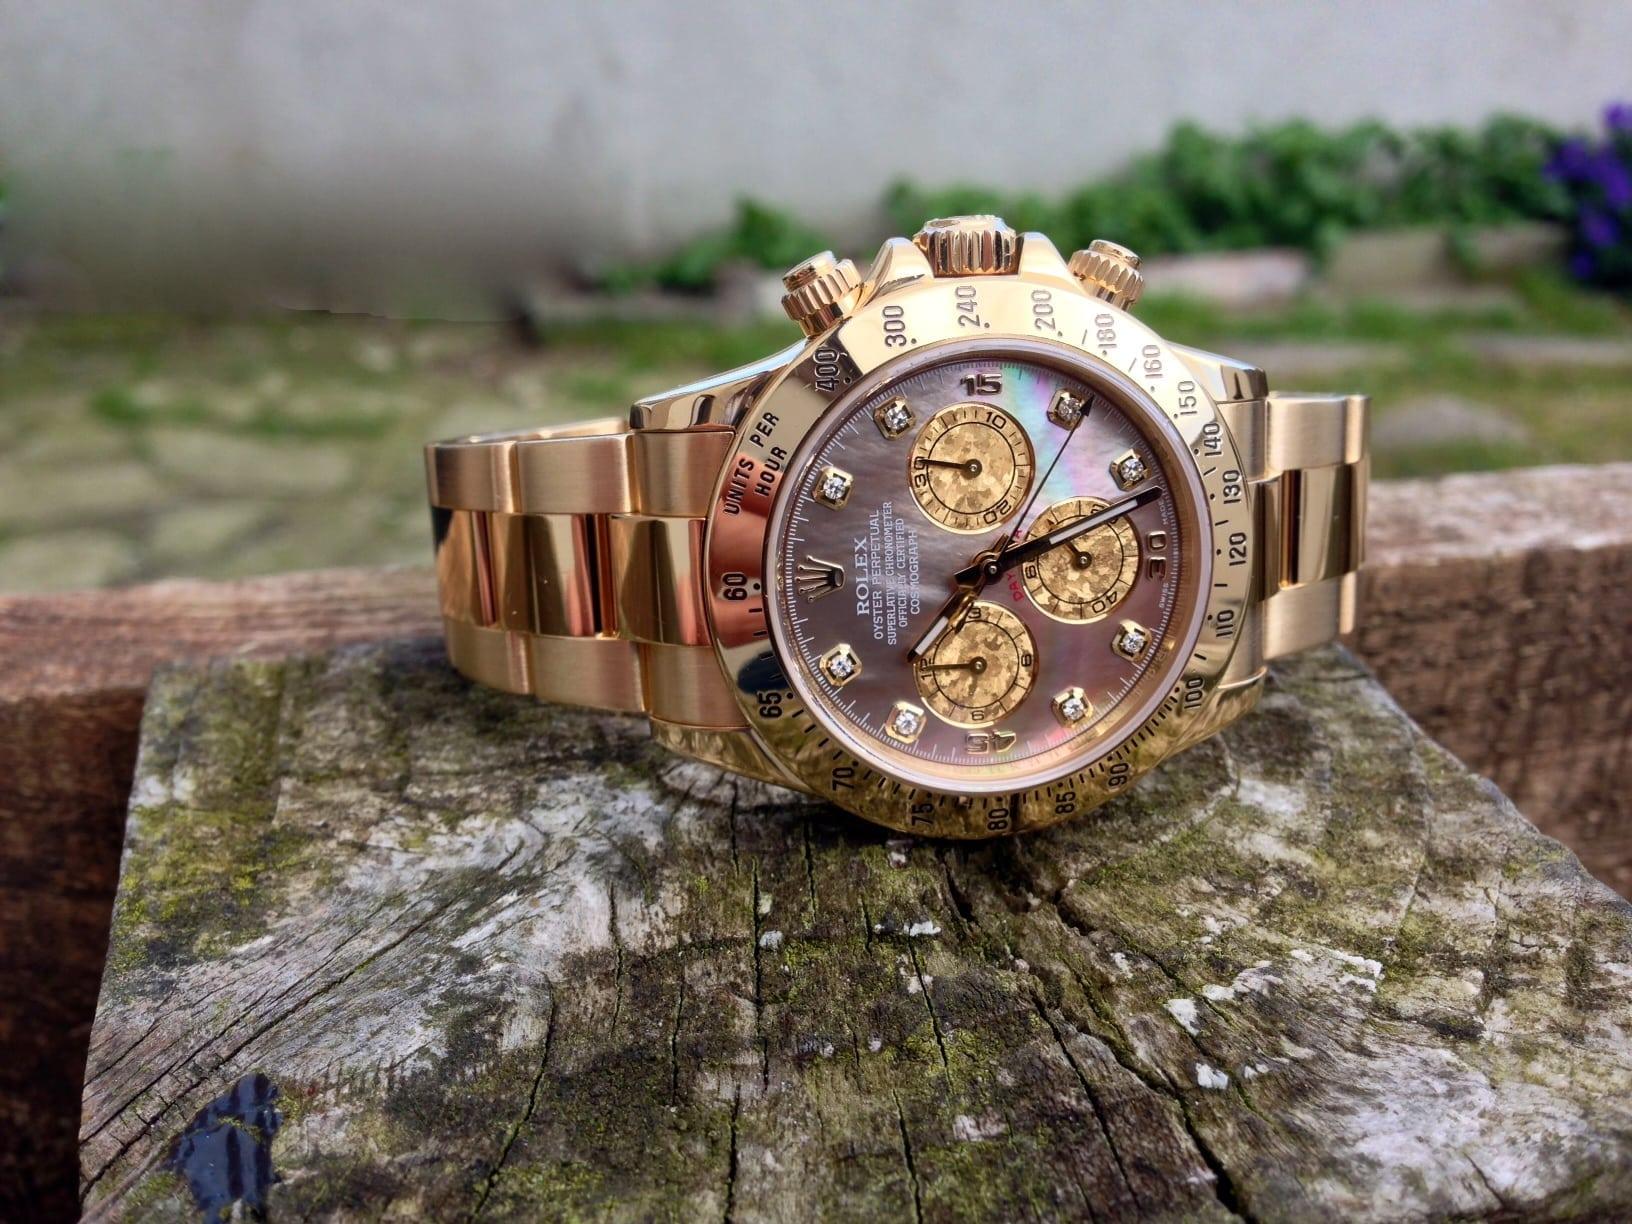 Rolex Daytona Gents 18ct. mop. Gold Crystal dial.Ref 116528